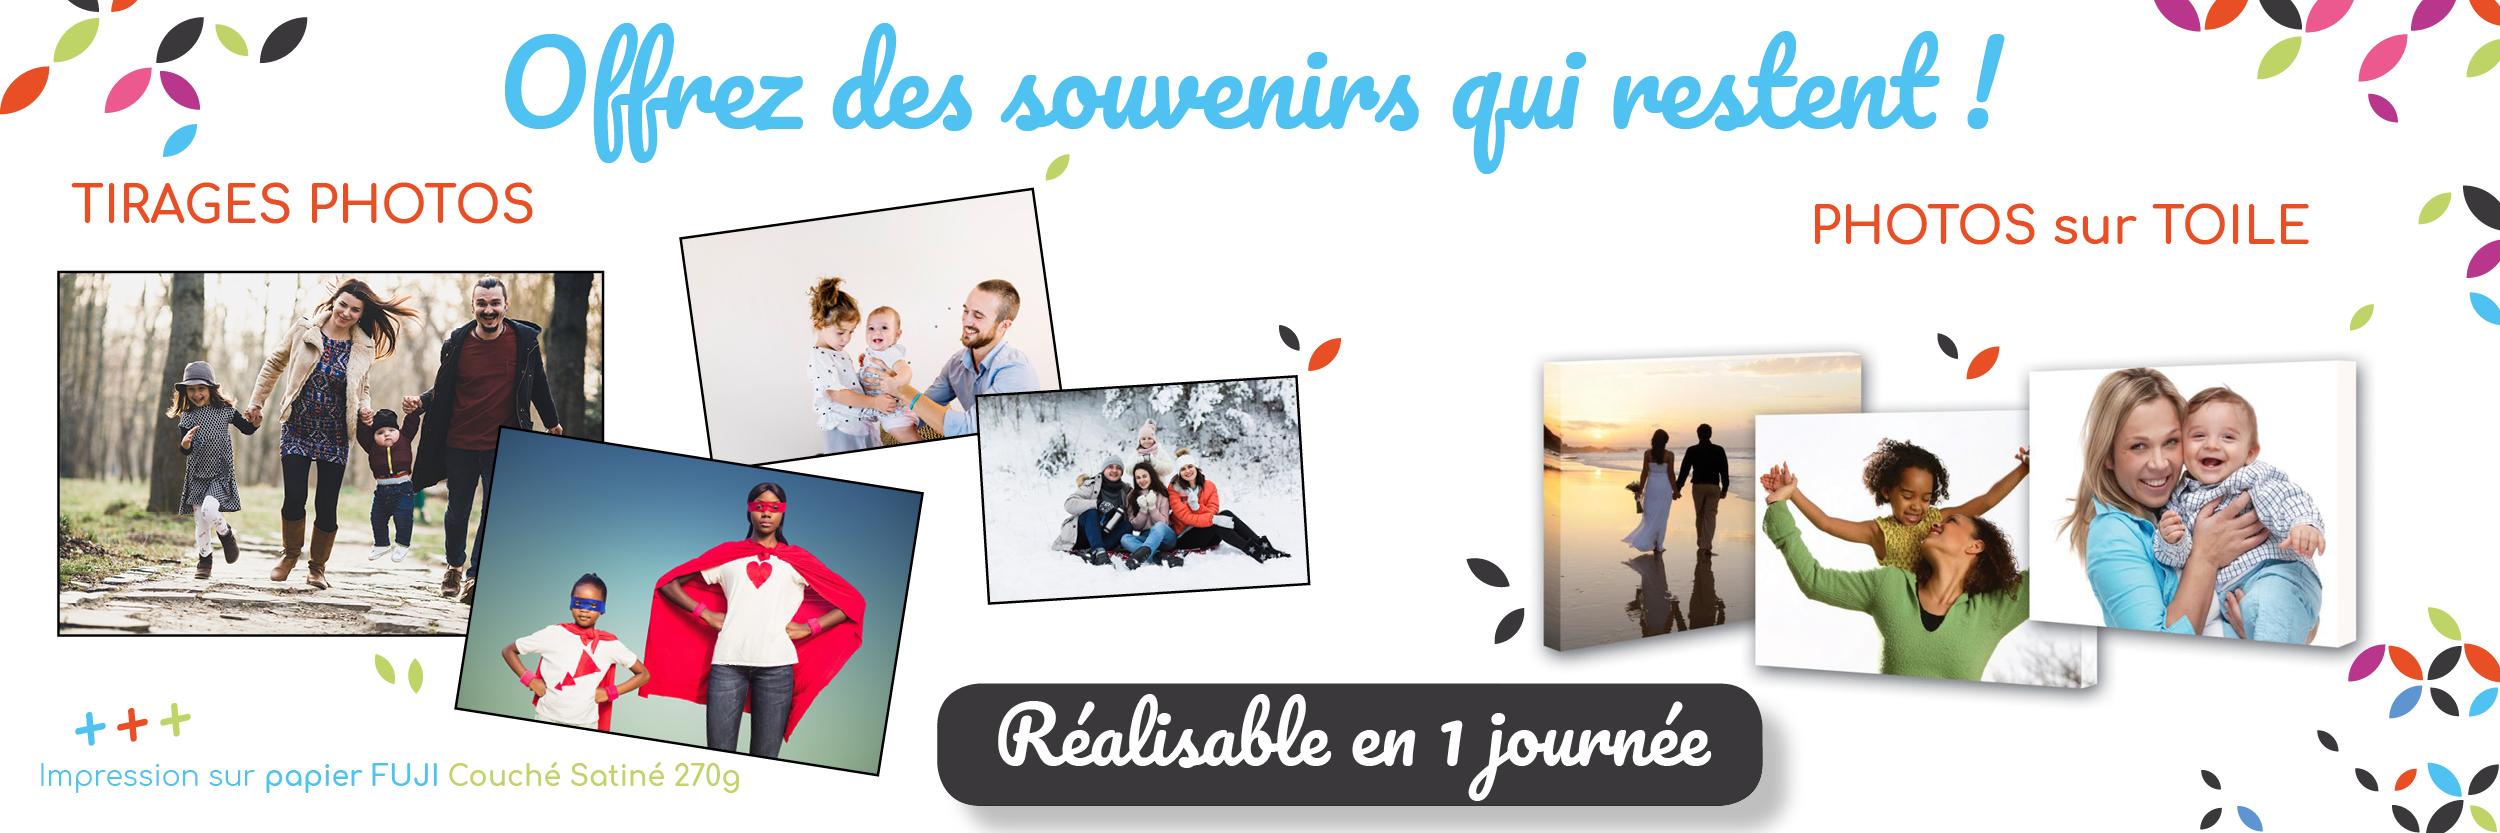 Bannières WEB_Totebag_Teeshirt_Tiragephotos-Copycolorbressuire2